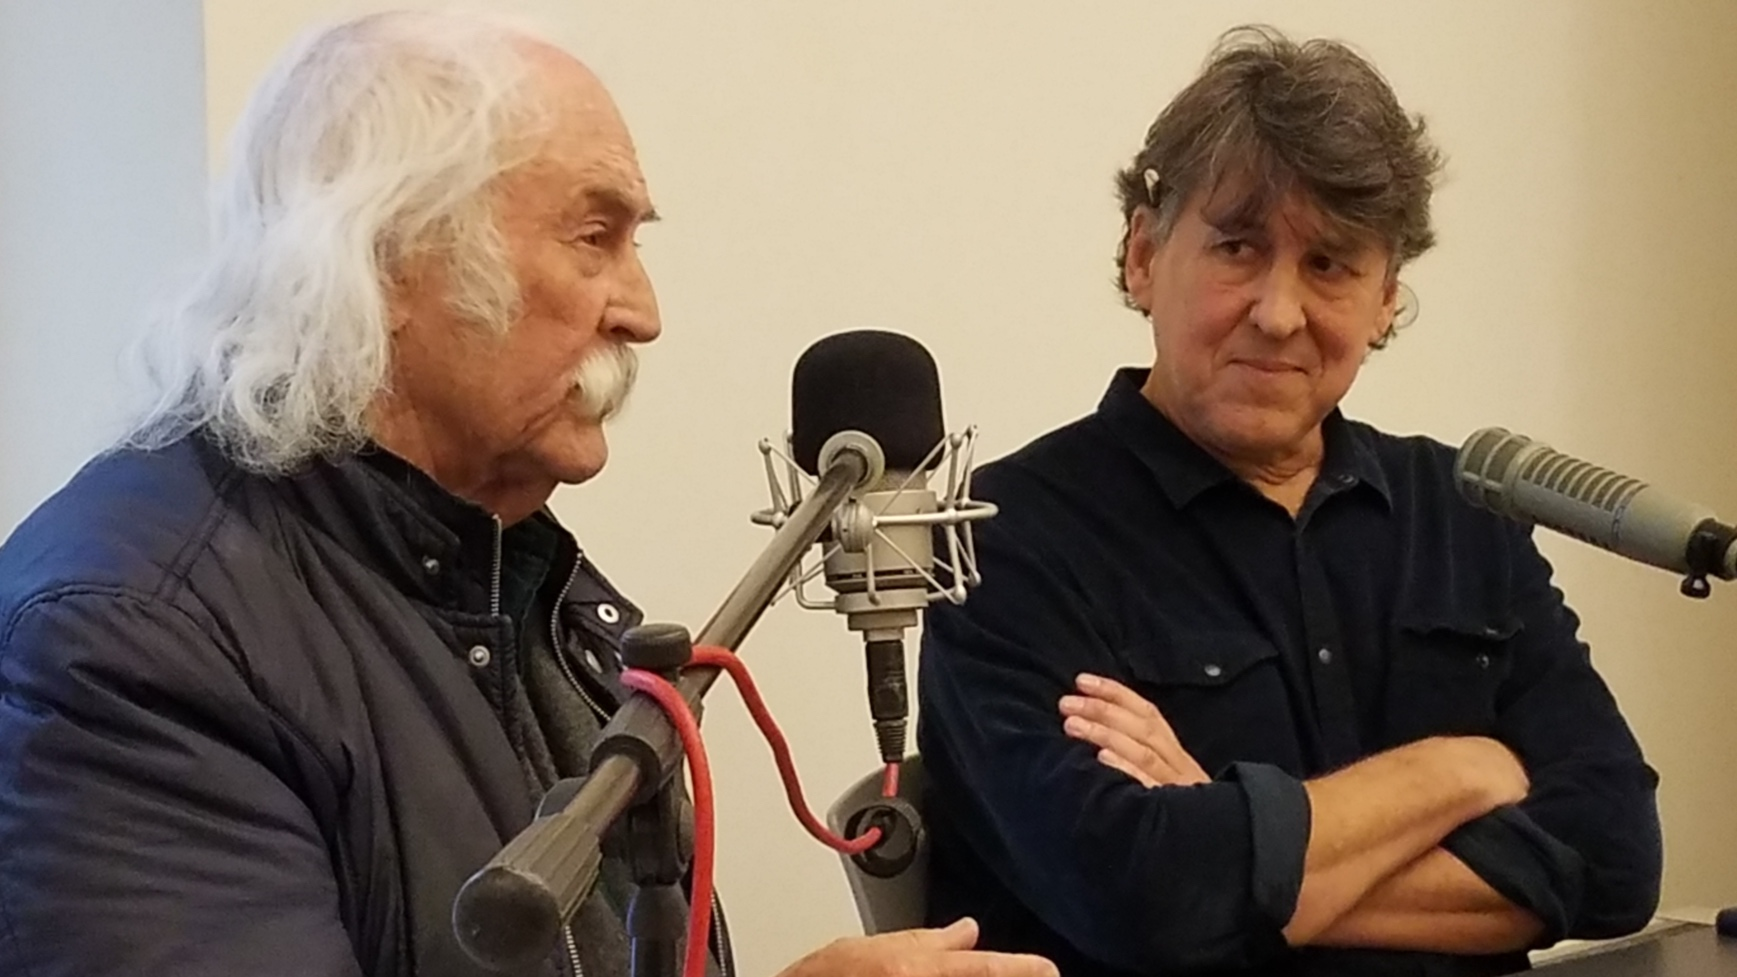 David Crosby & Cameron Crowe interviewed by Paul Chuffo.